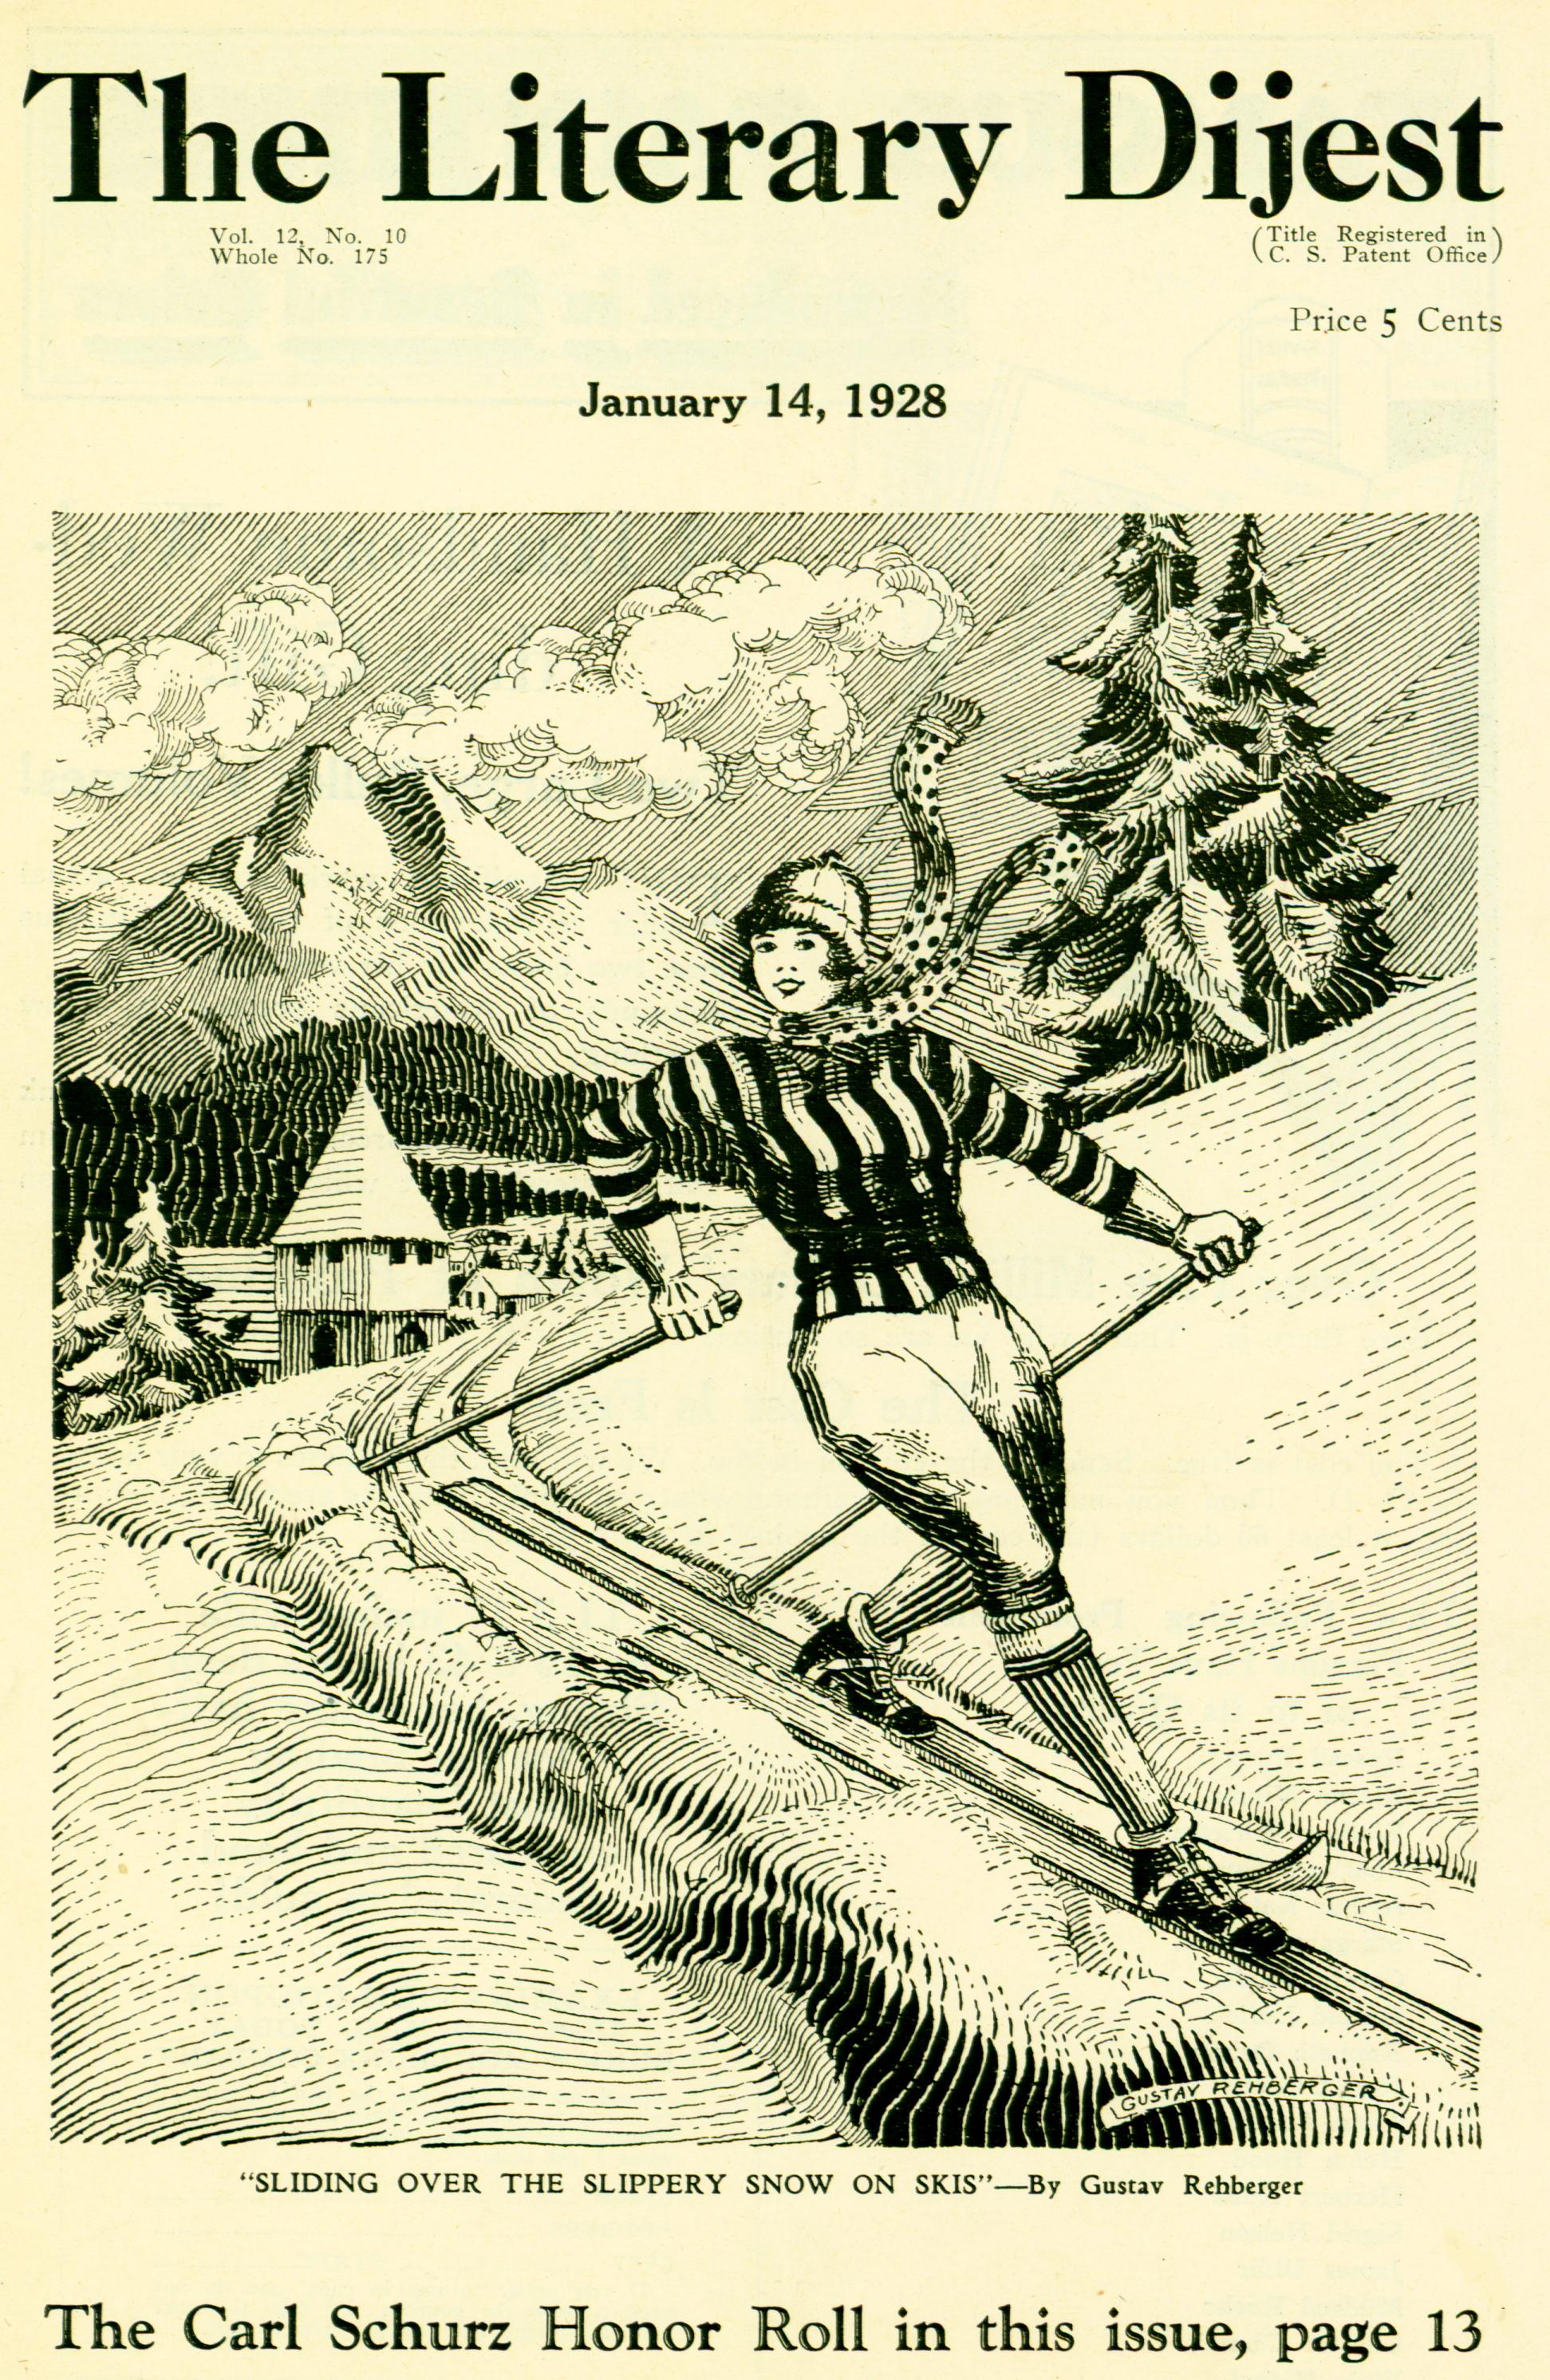 1928 - The Literary Dijest - The Carl Schurz High School (Pen & ink, 7 x 6)